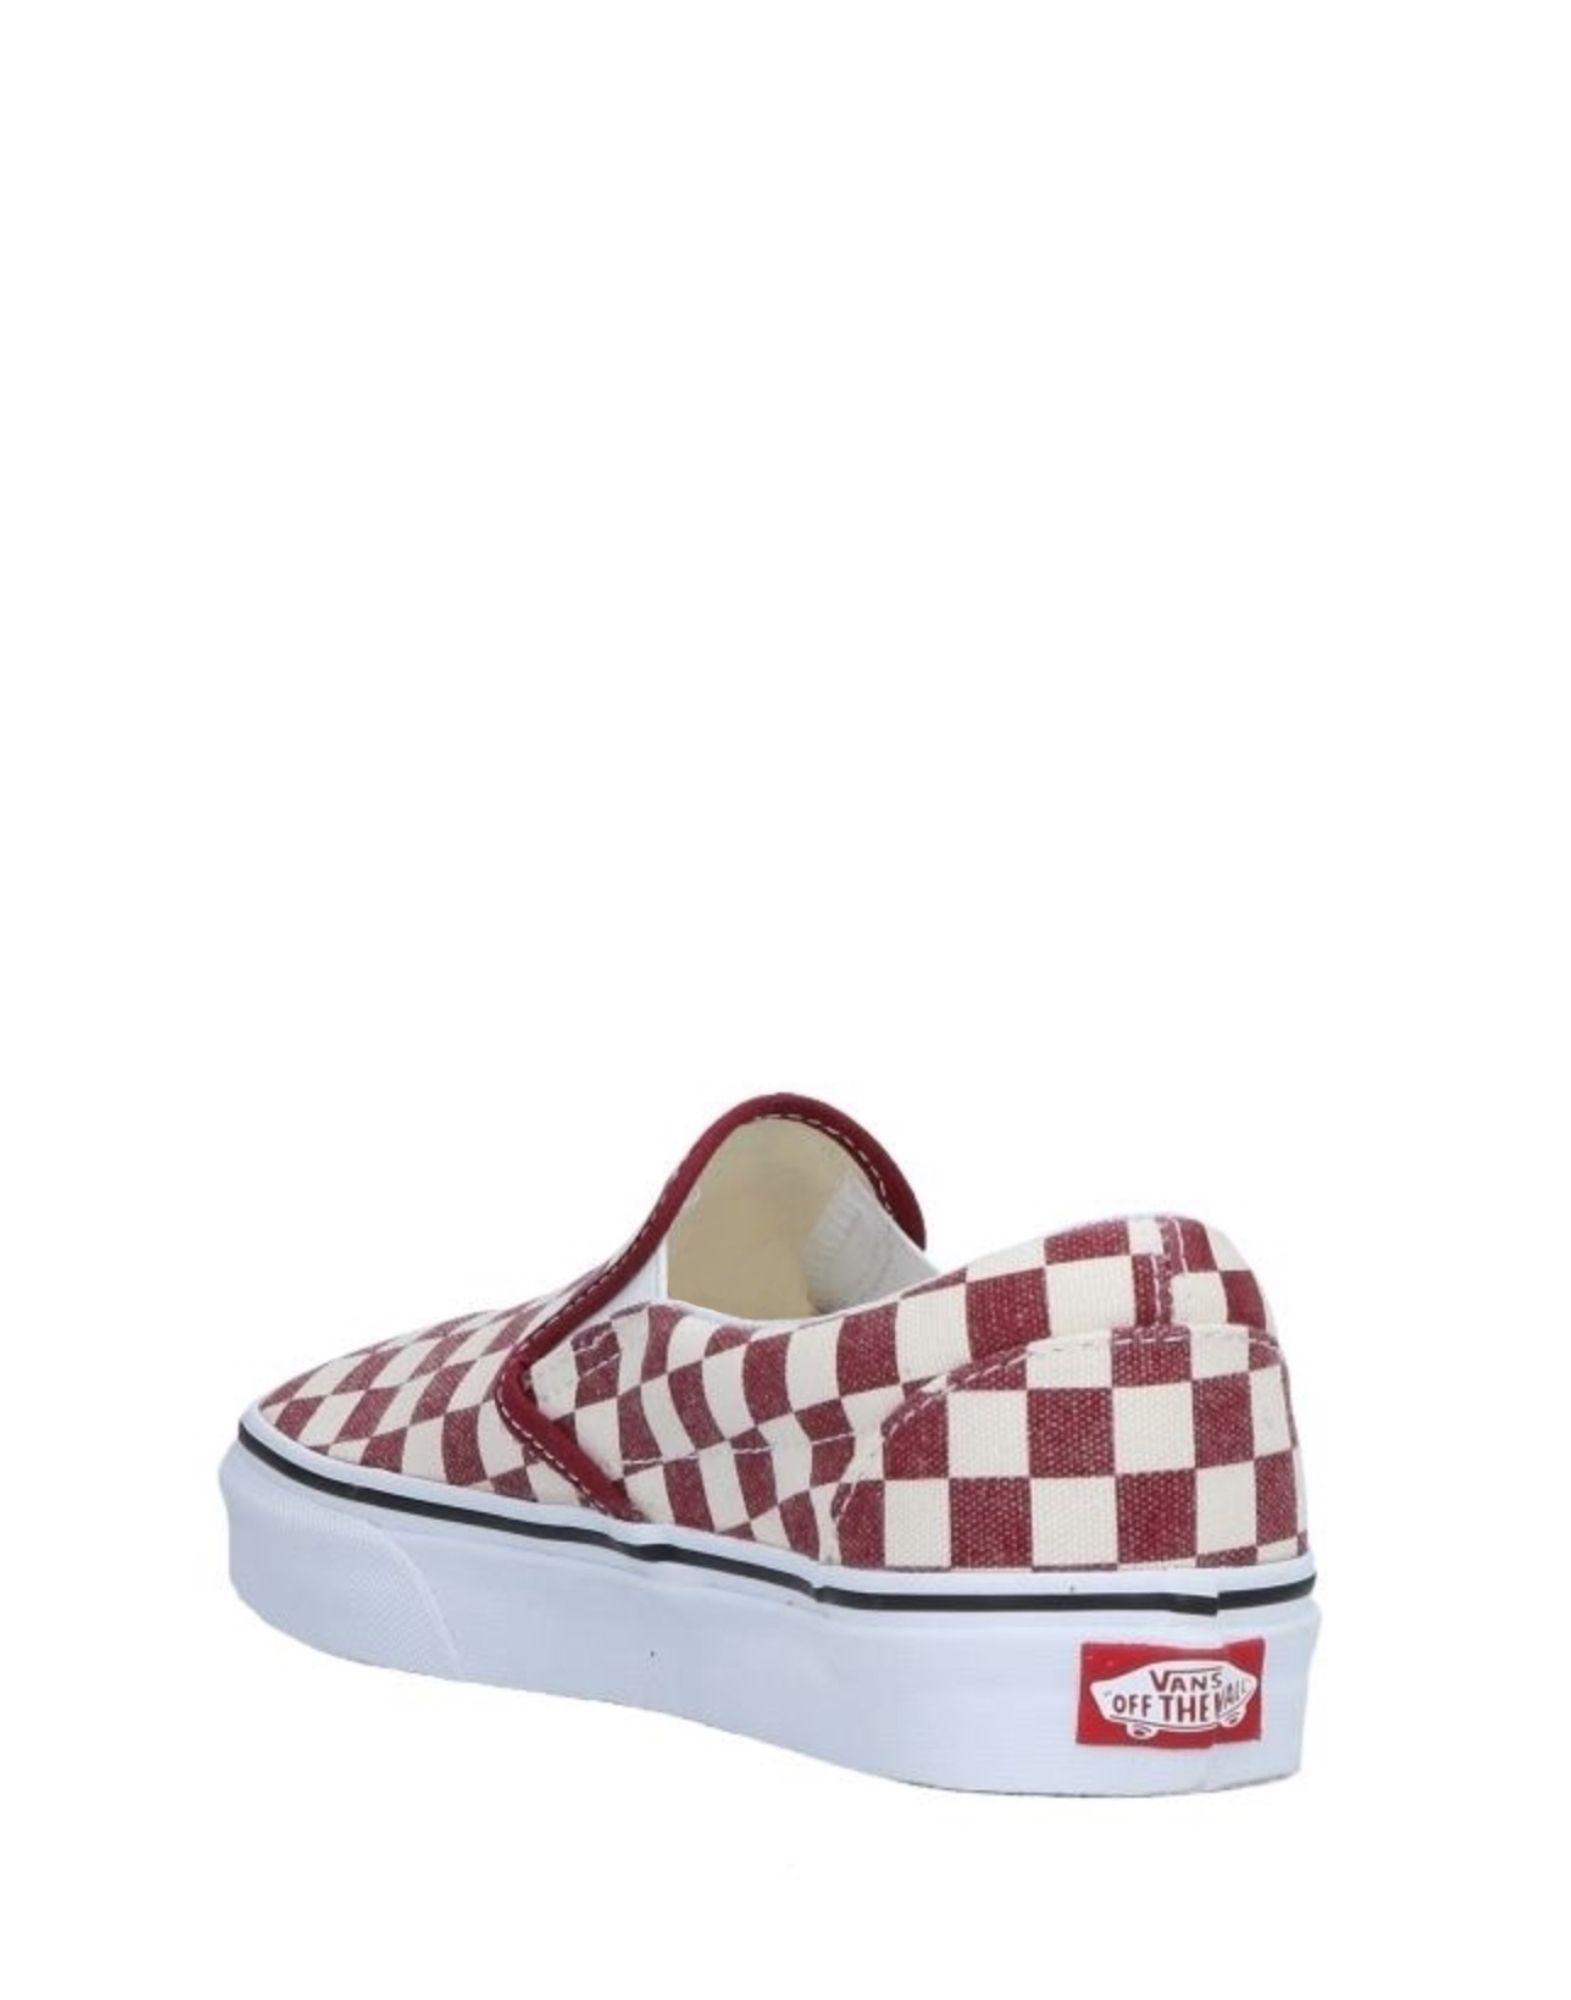 Vans Sneakers Damen  11538149QH   11538149QH 774876